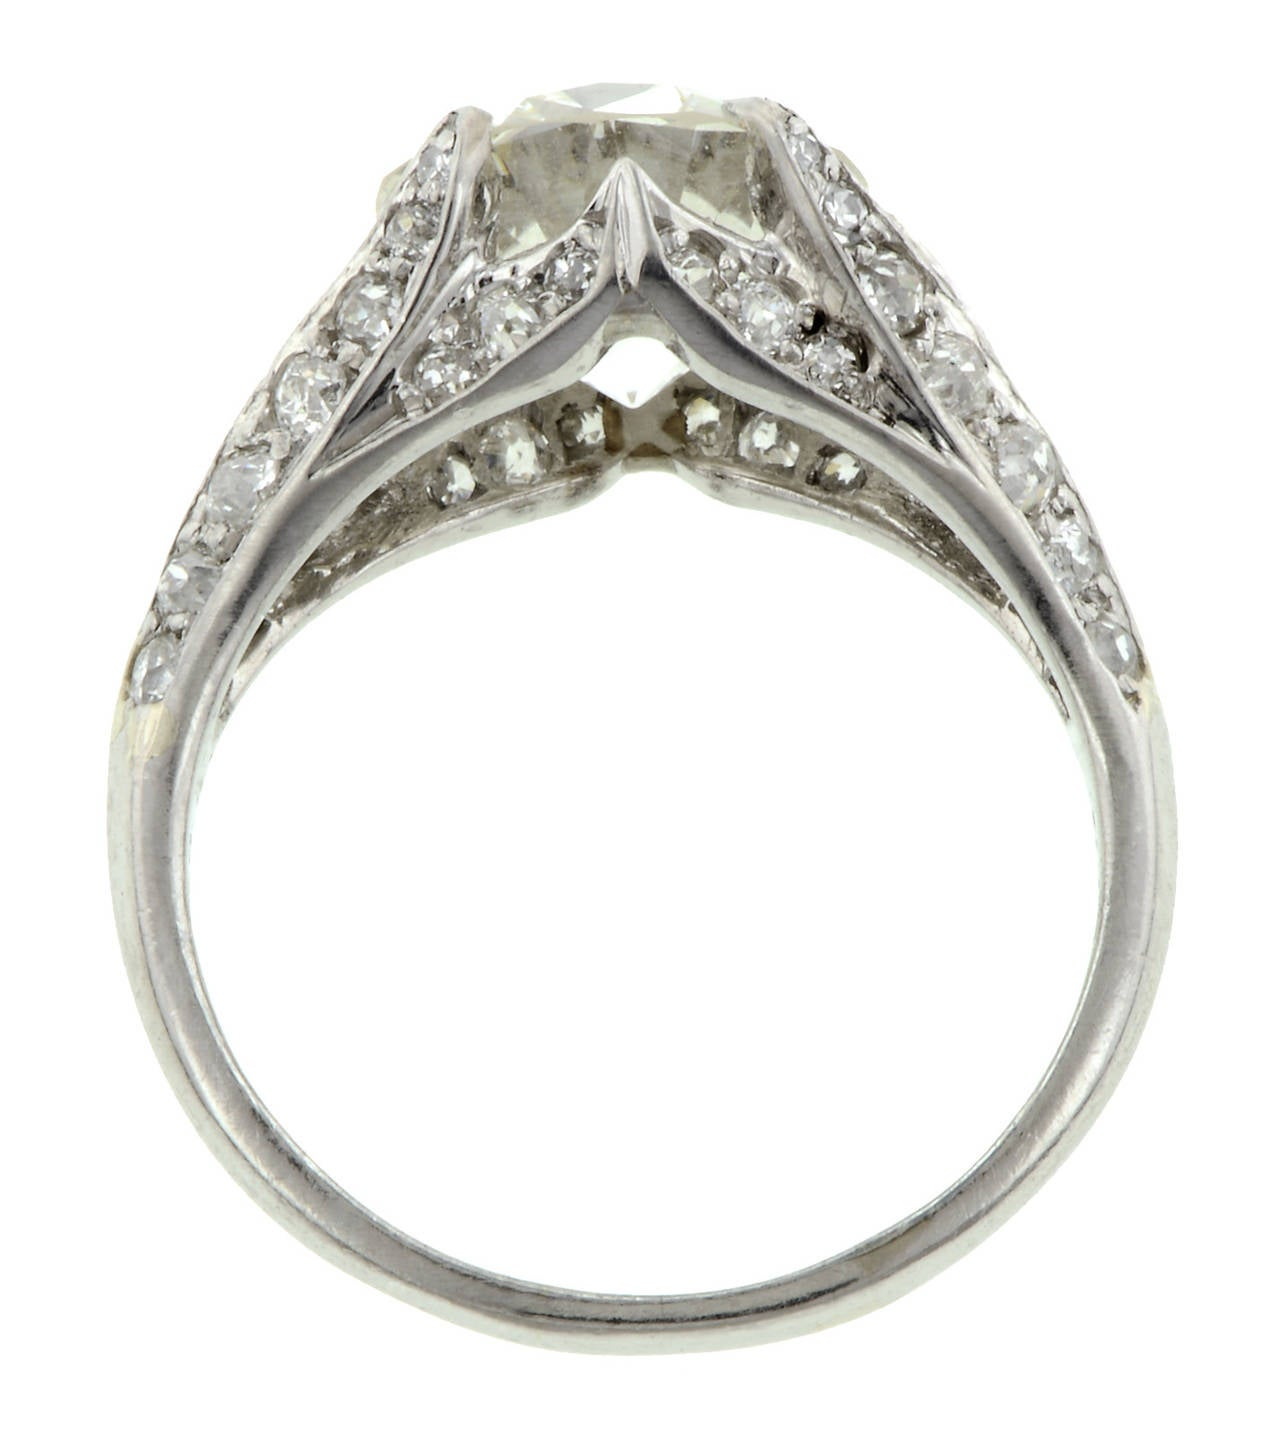 3 00 Carat Diamond Platinum Flamelike Motif Engagement Ring at 1stdibs